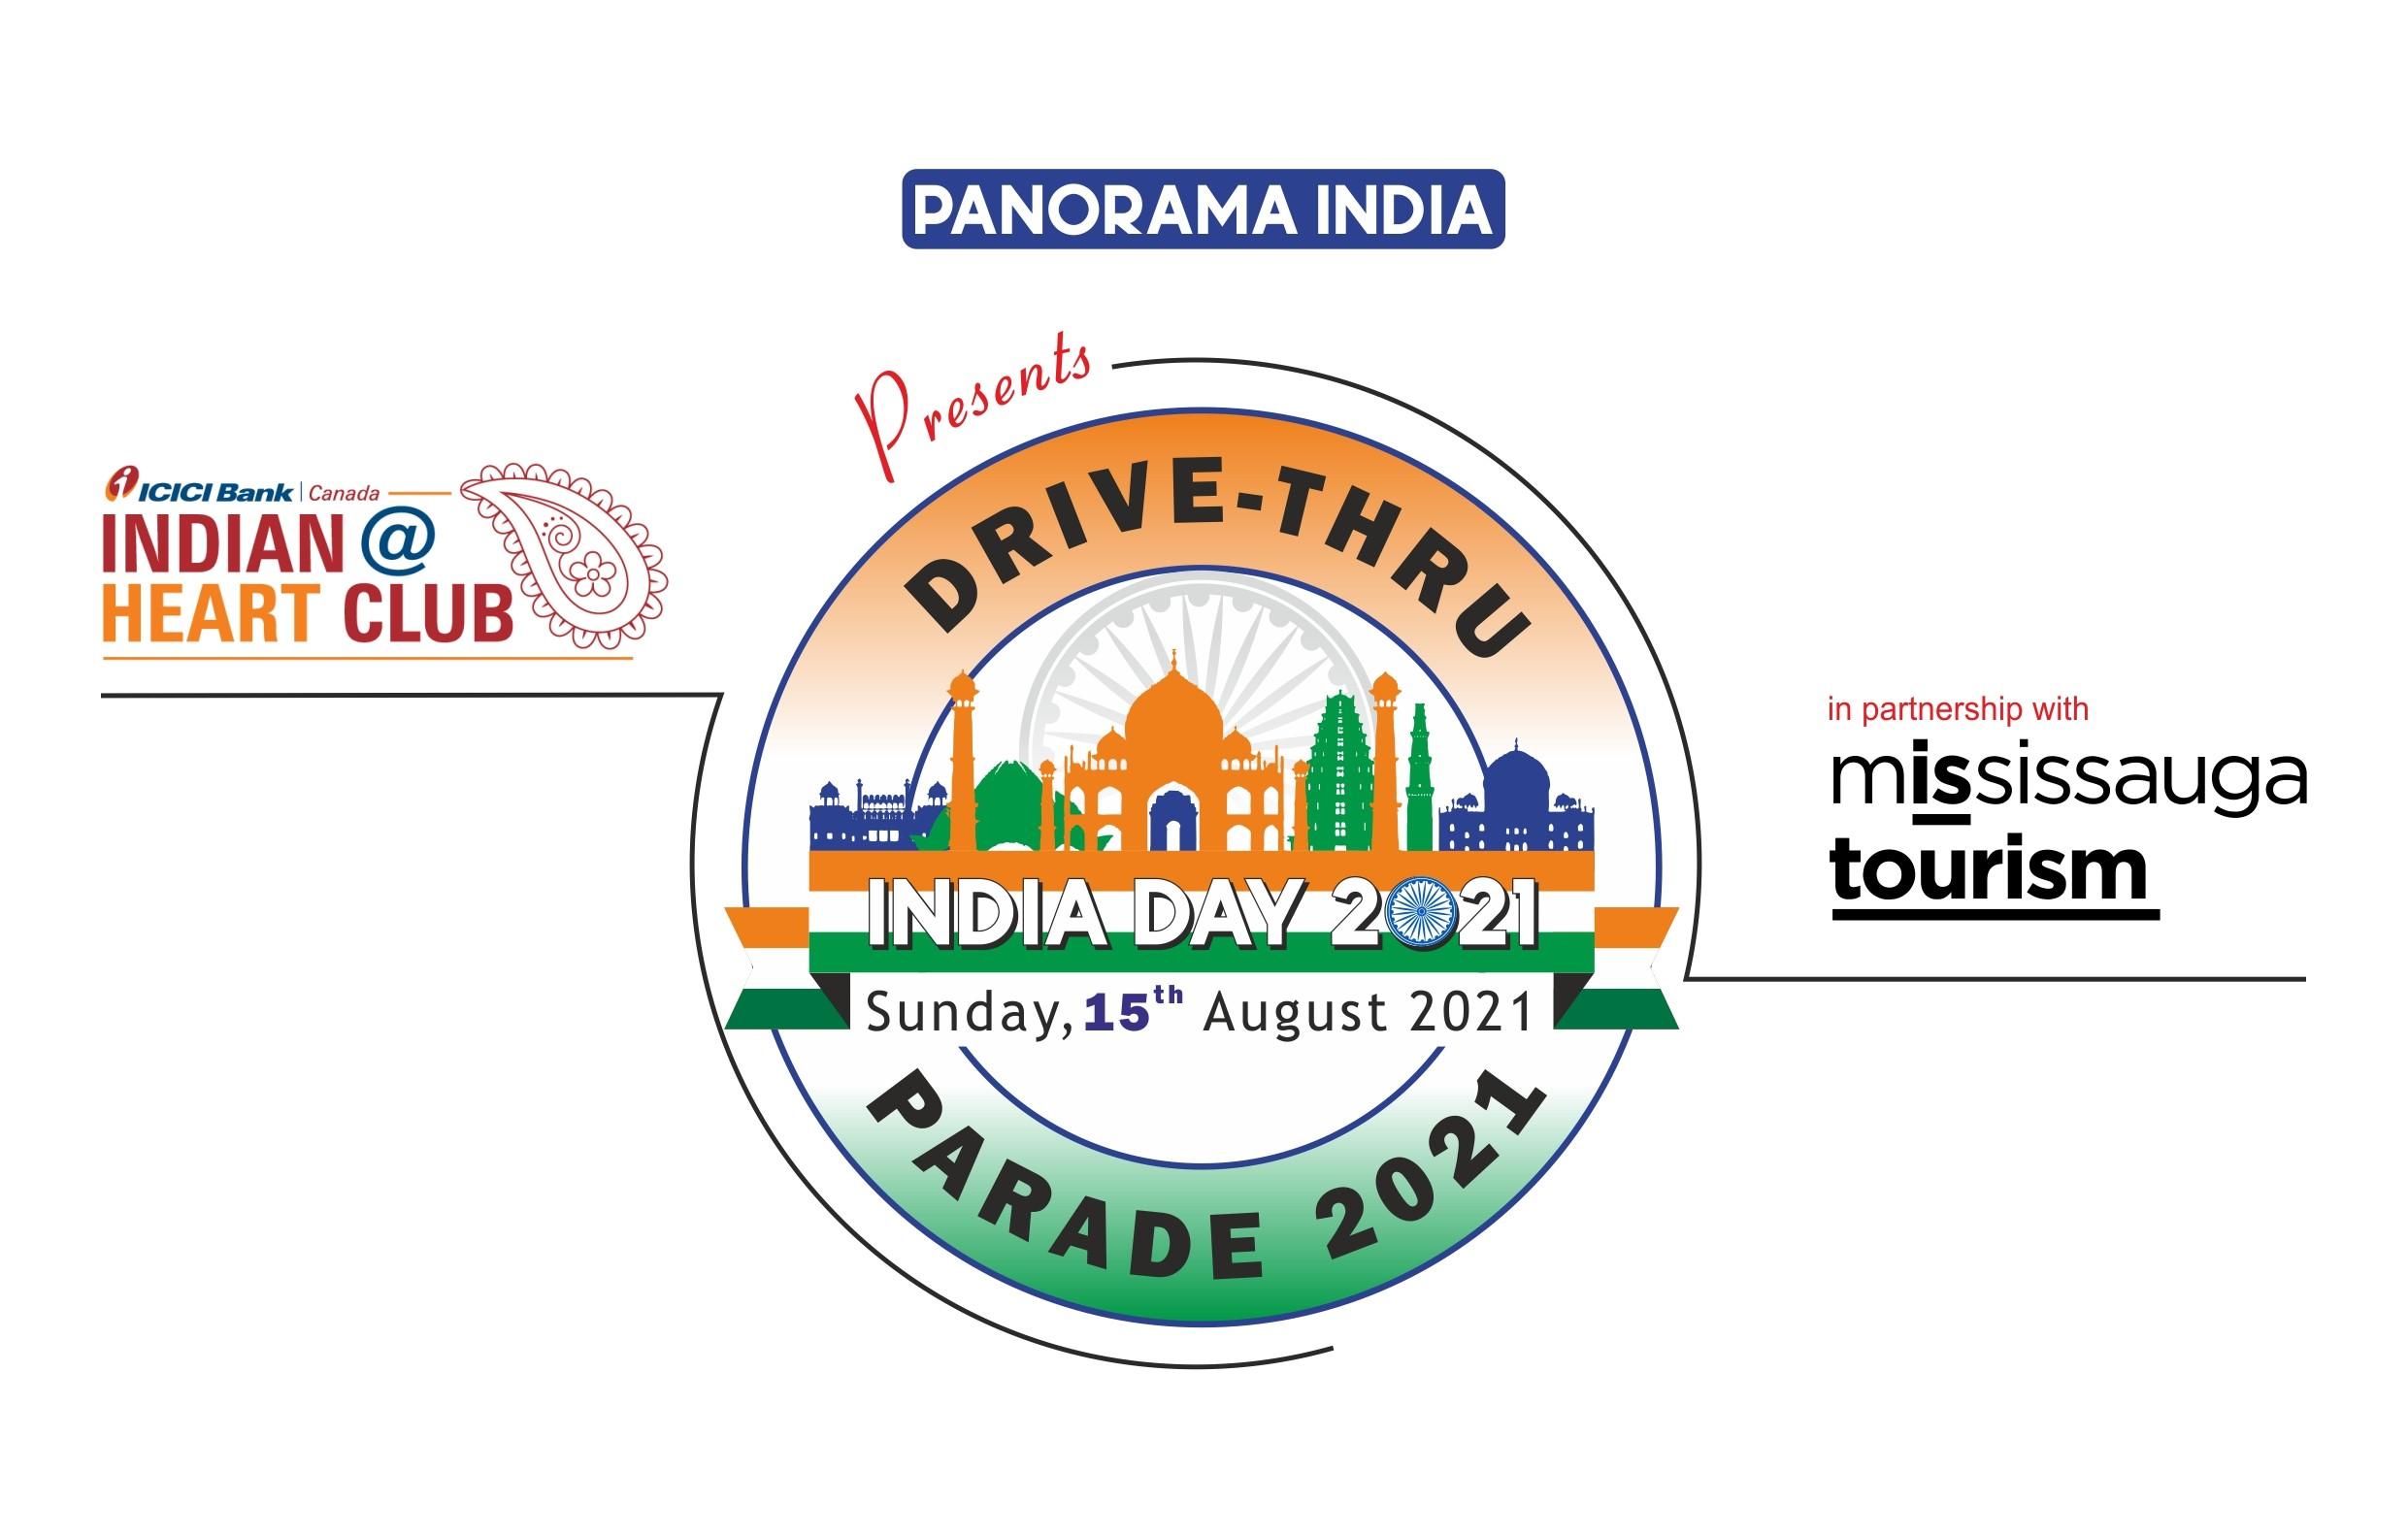 DRIVE THRU INDIA DAY PARADE 2021 on Nouveau iDEA